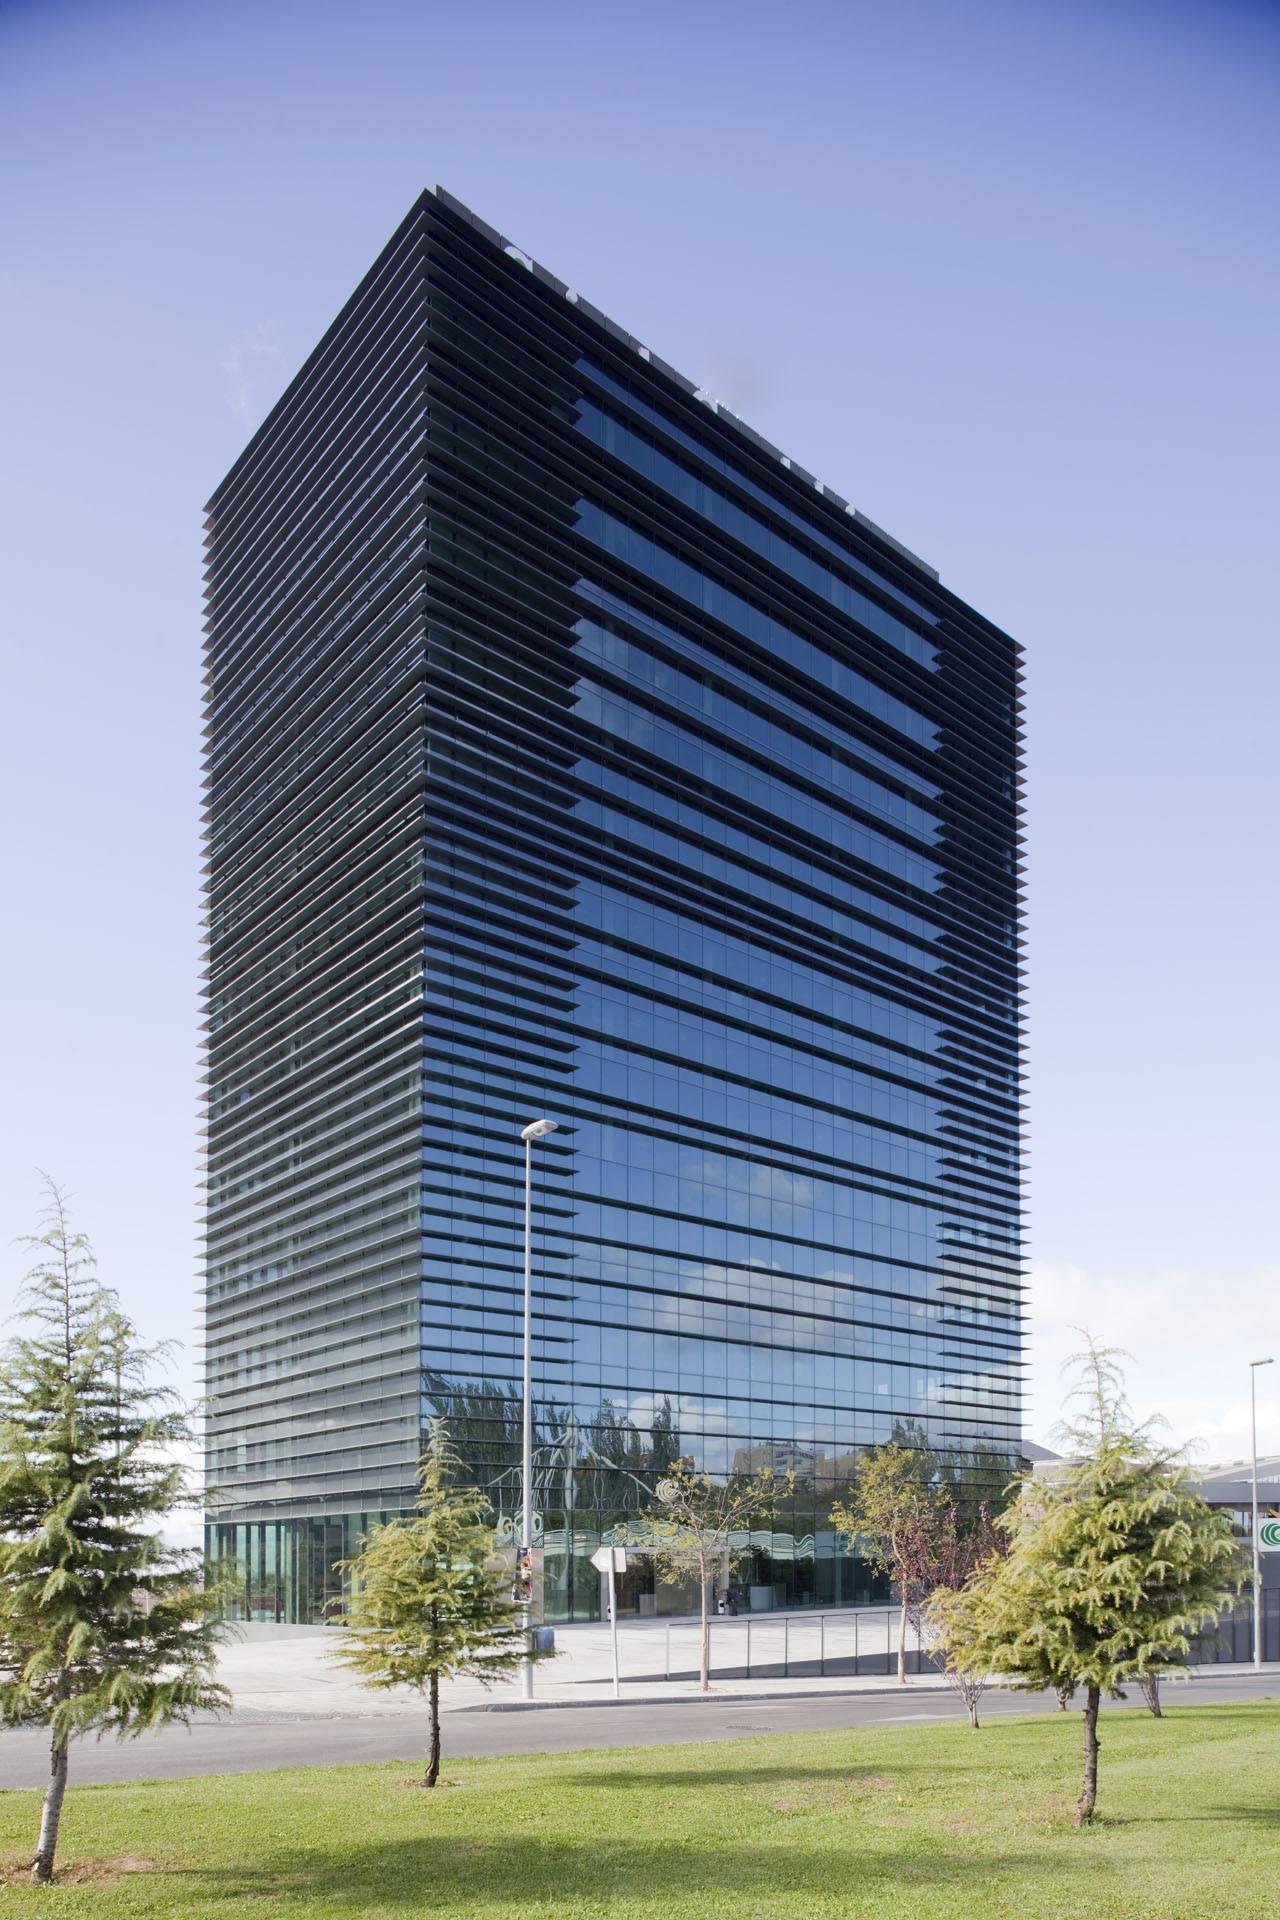 Caja de guadalajara office building solano catal n for Office building design architecture